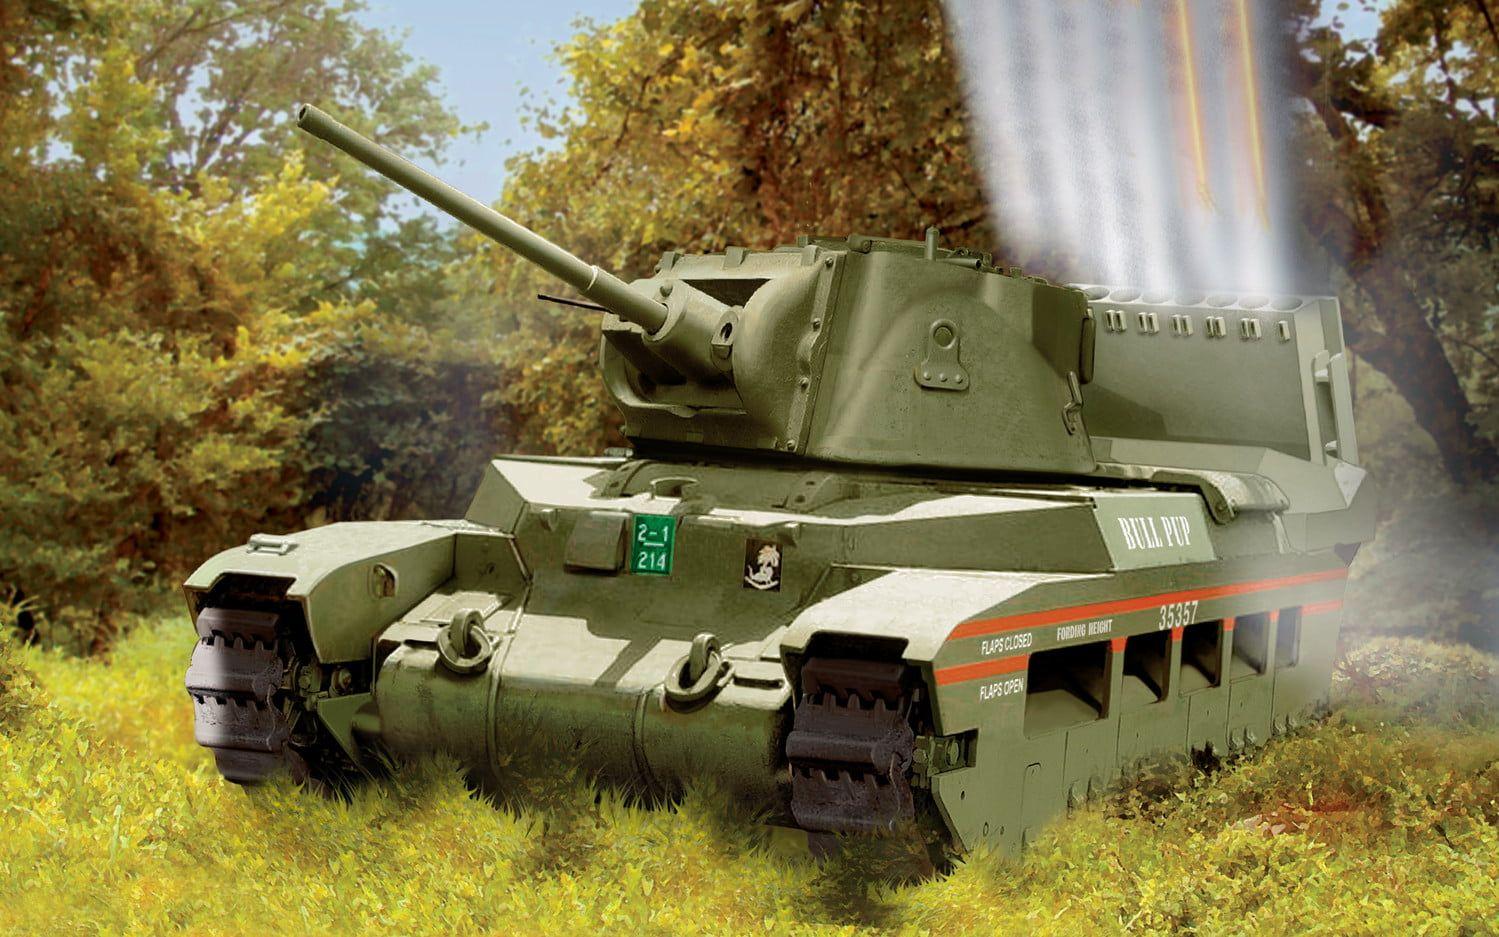 Airfix Matilda Hedgehog Tank 1:76 Scale Plastic Model Kit